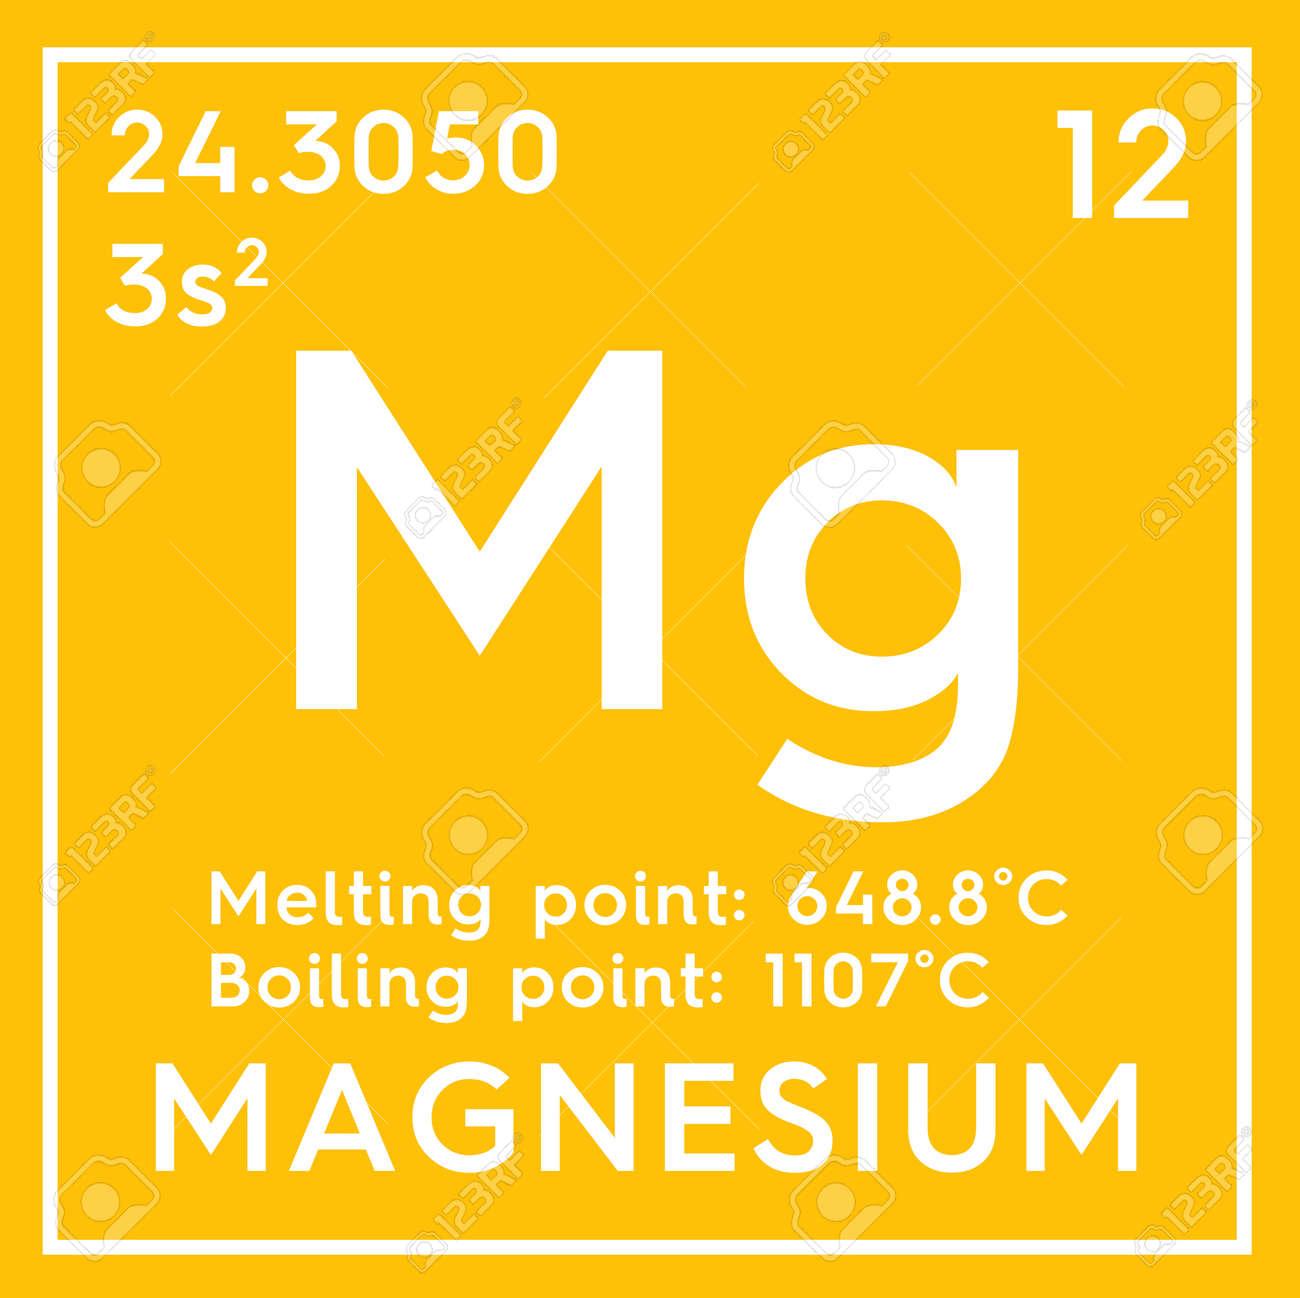 Magnesium alkaline earth metals chemical element of mendeleevs alkaline earth metals chemical element of mendeleevs periodic table in square cube urtaz Images